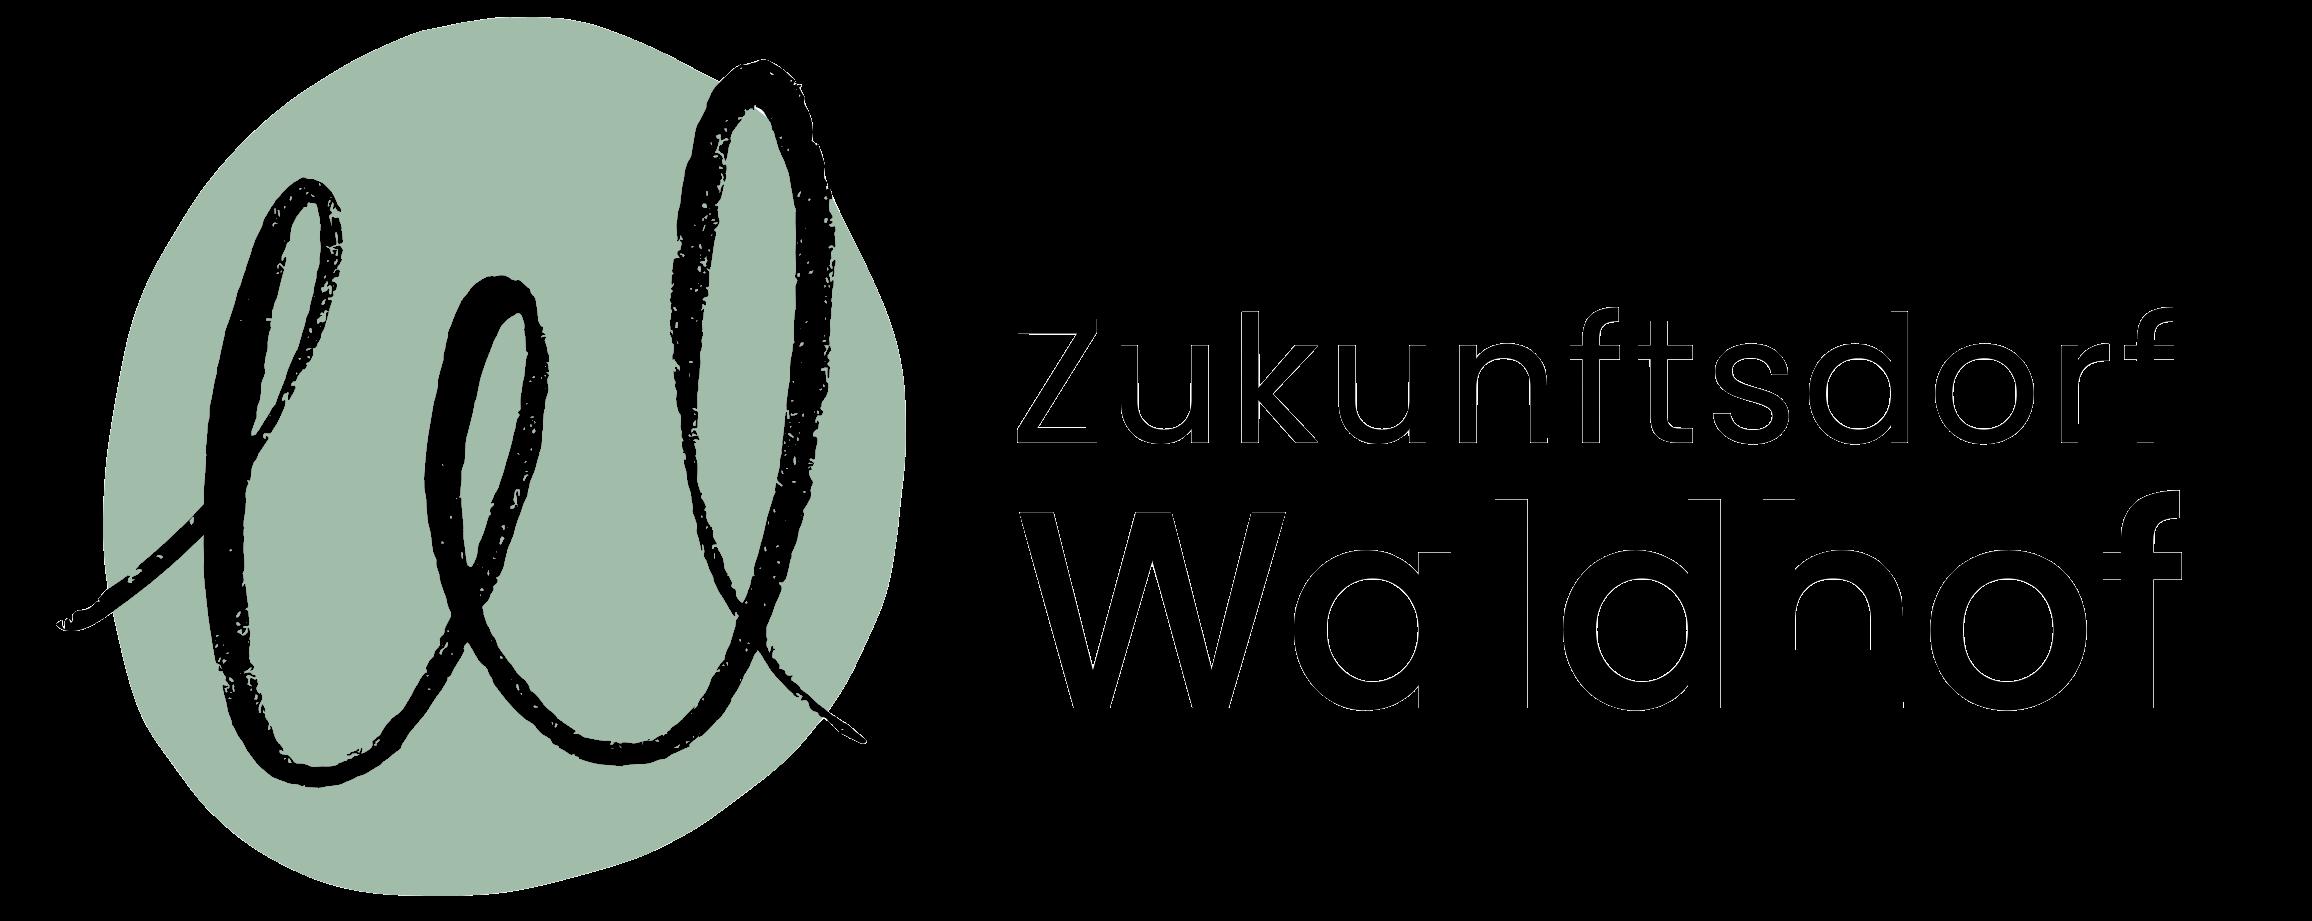 Zukunftsdorf Waldhof